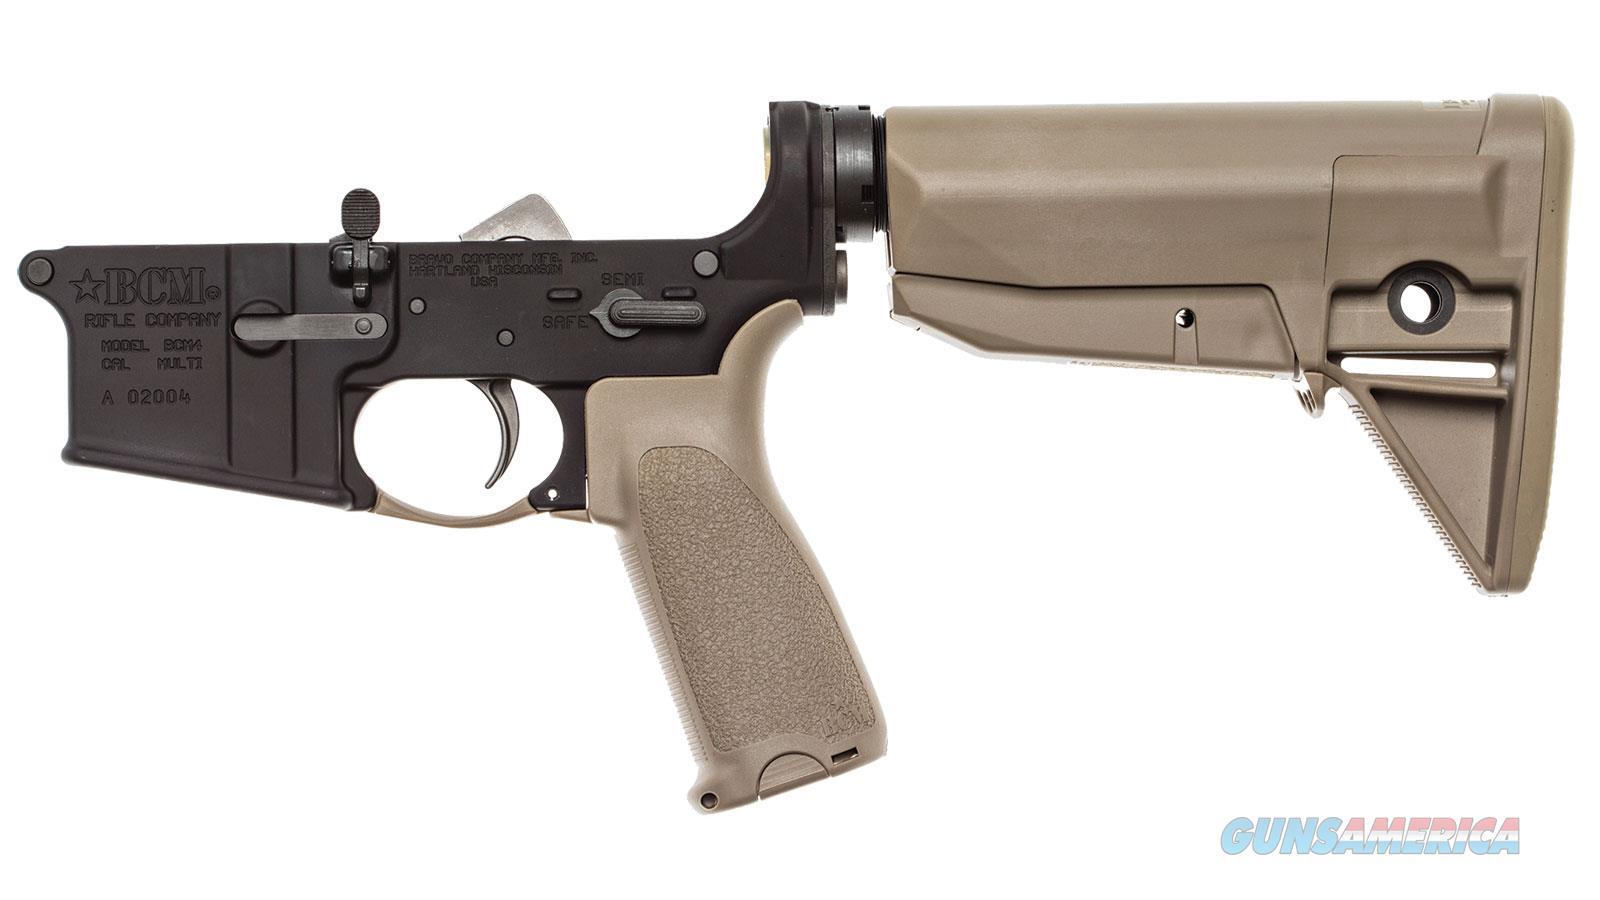 Bravo Company Usa Bcm4 5.56 Lower Rec 30Rd LRG-STK-MOD-0-FDE  Guns > Rifles > B Misc Rifles